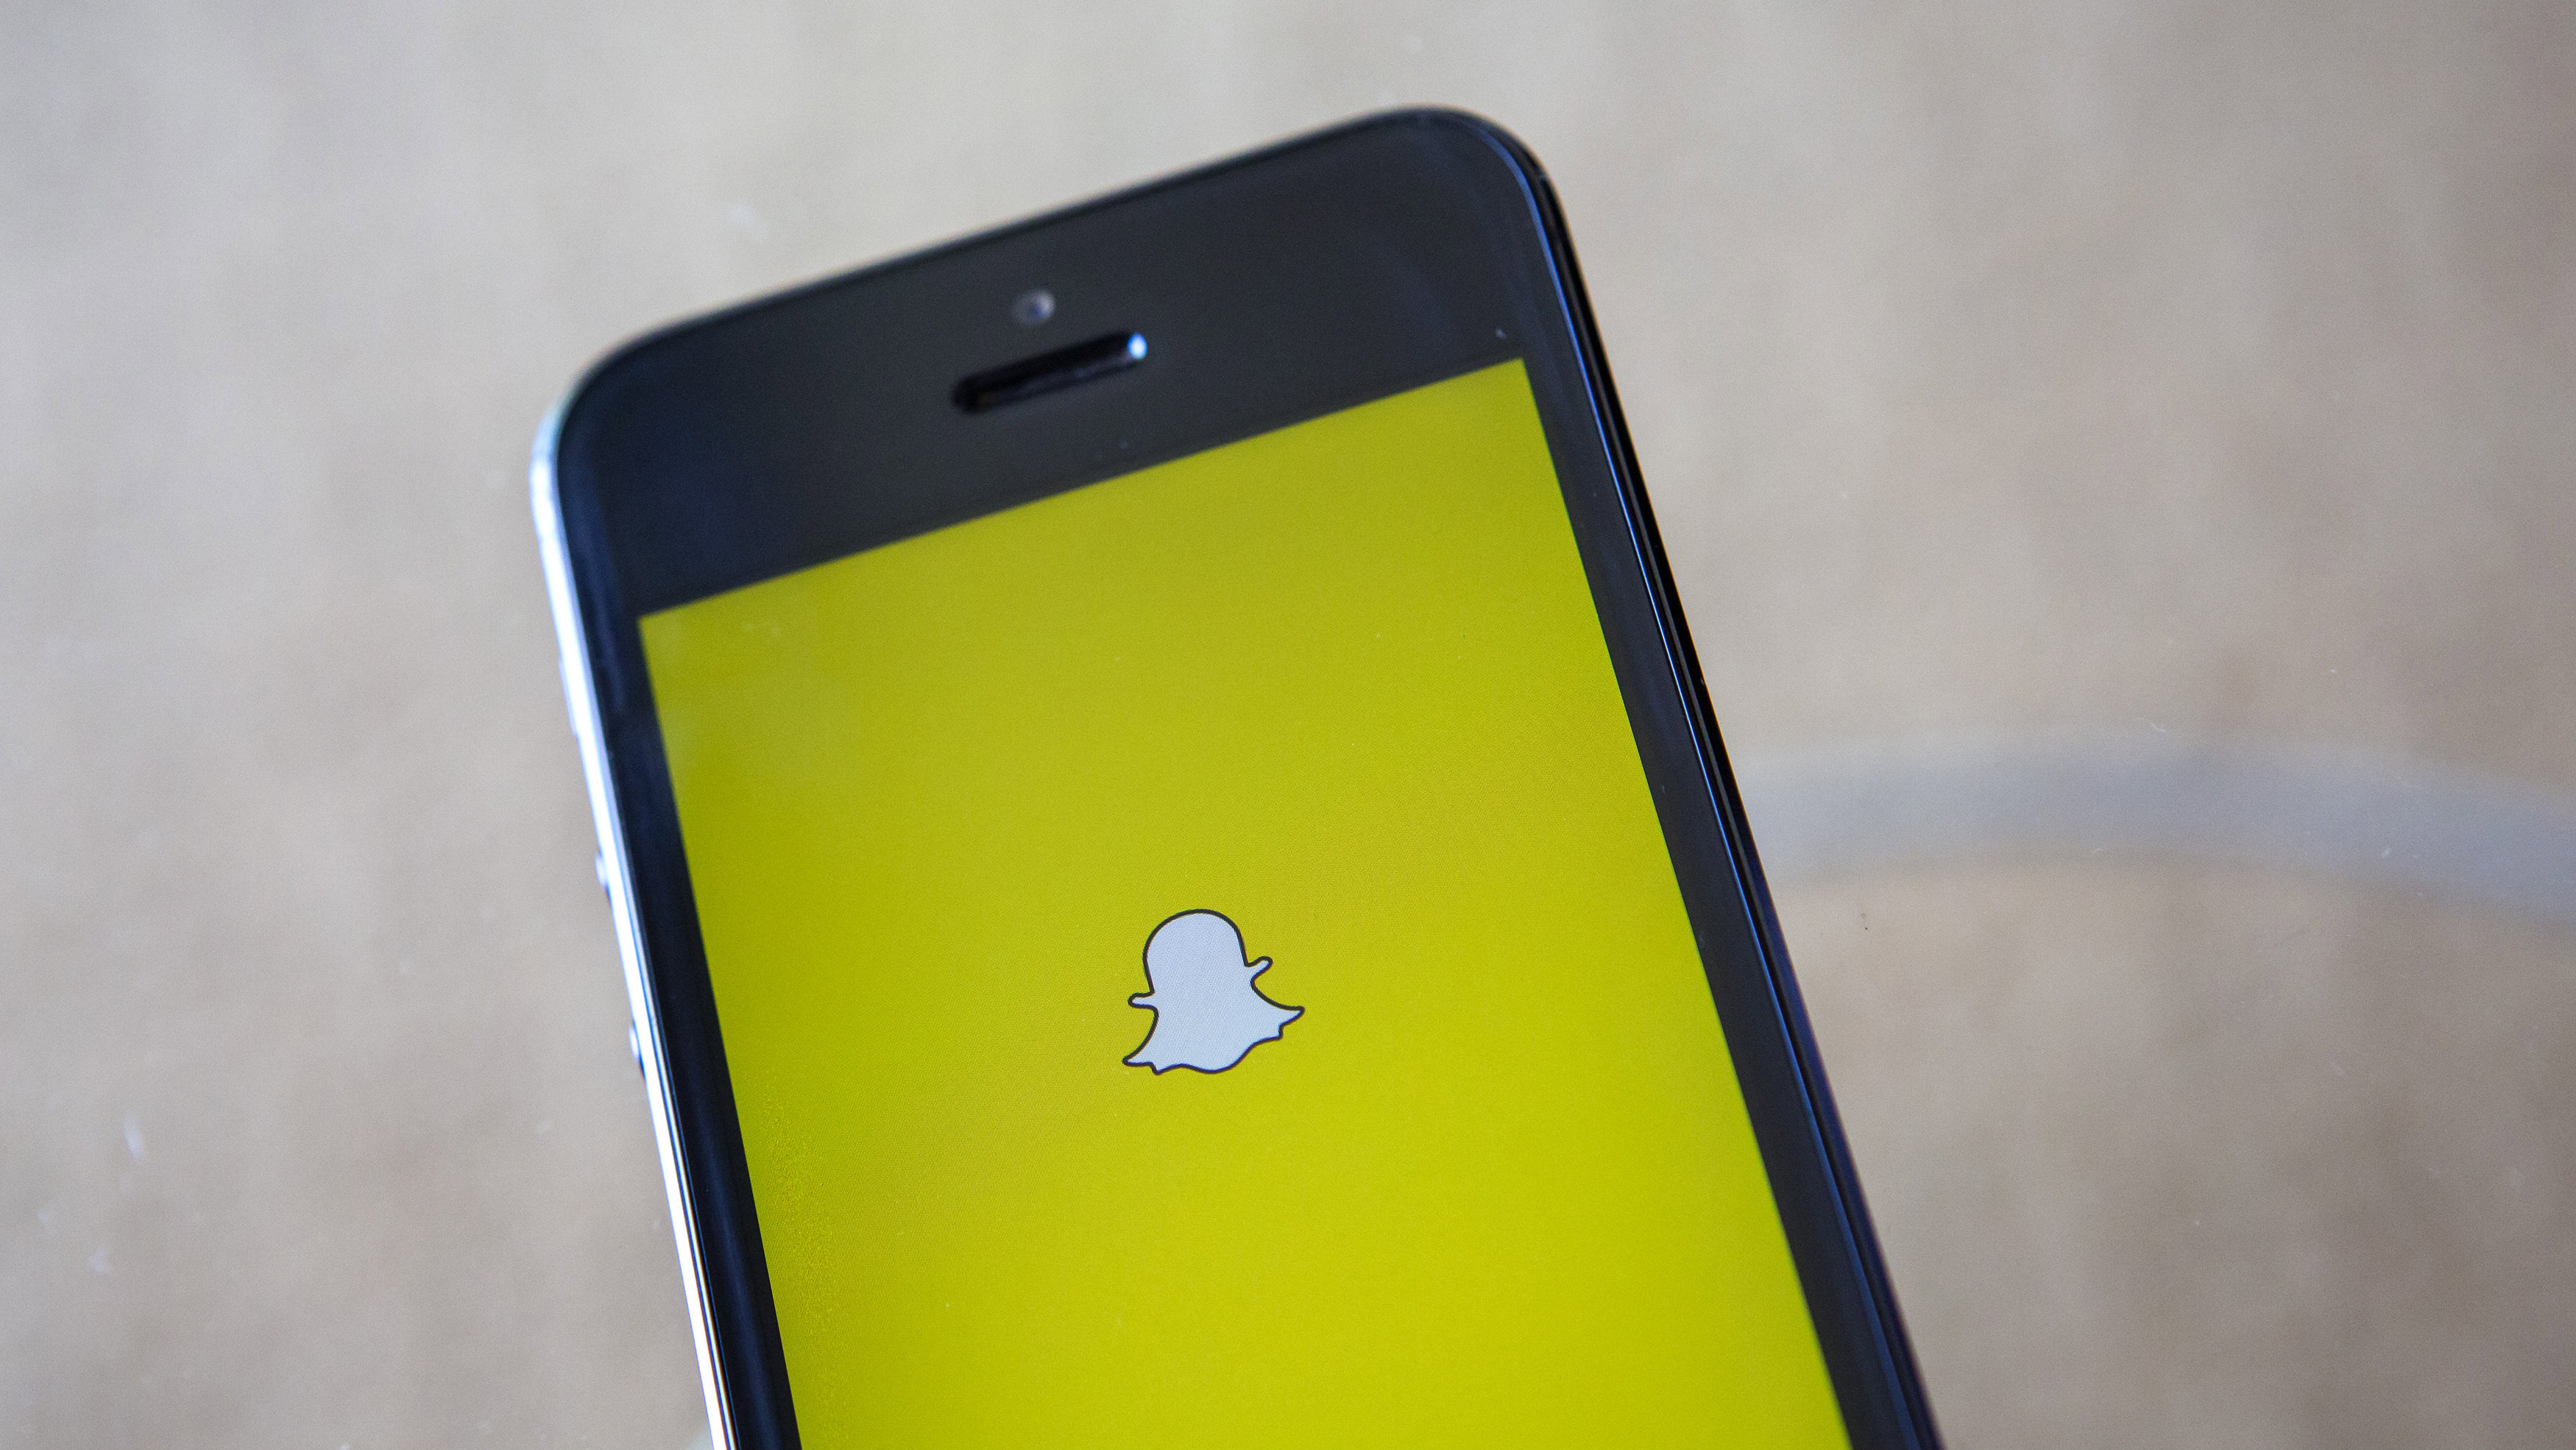 A portrait of the Snapchat logo in Ventura, California December 21, 2013.